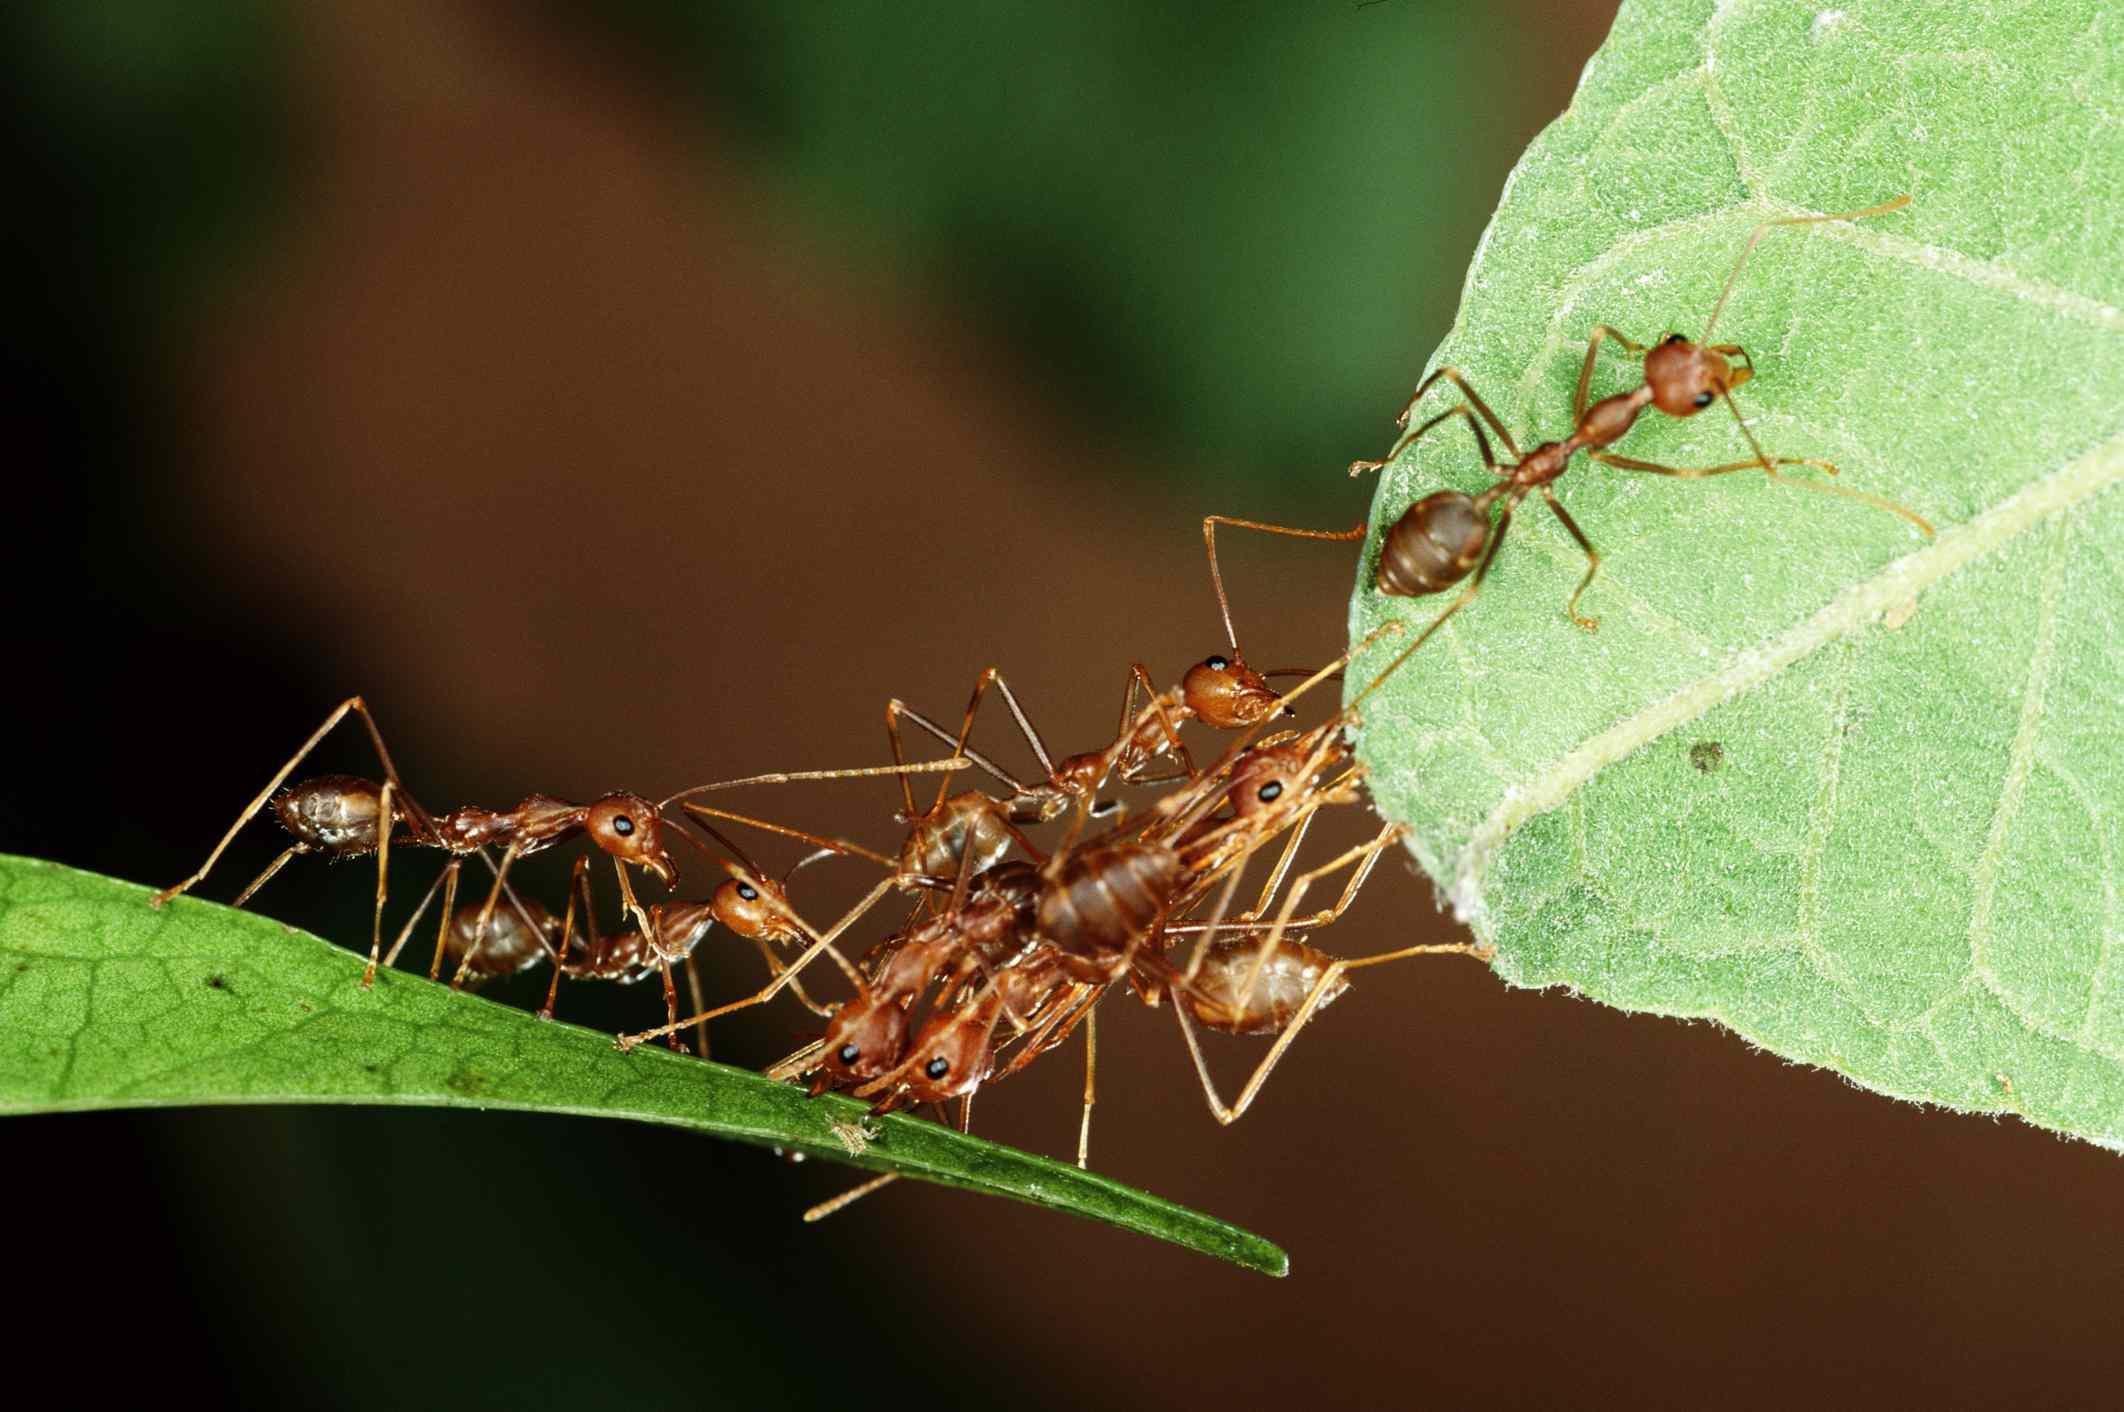 Weaver ants making a bridge across leaves